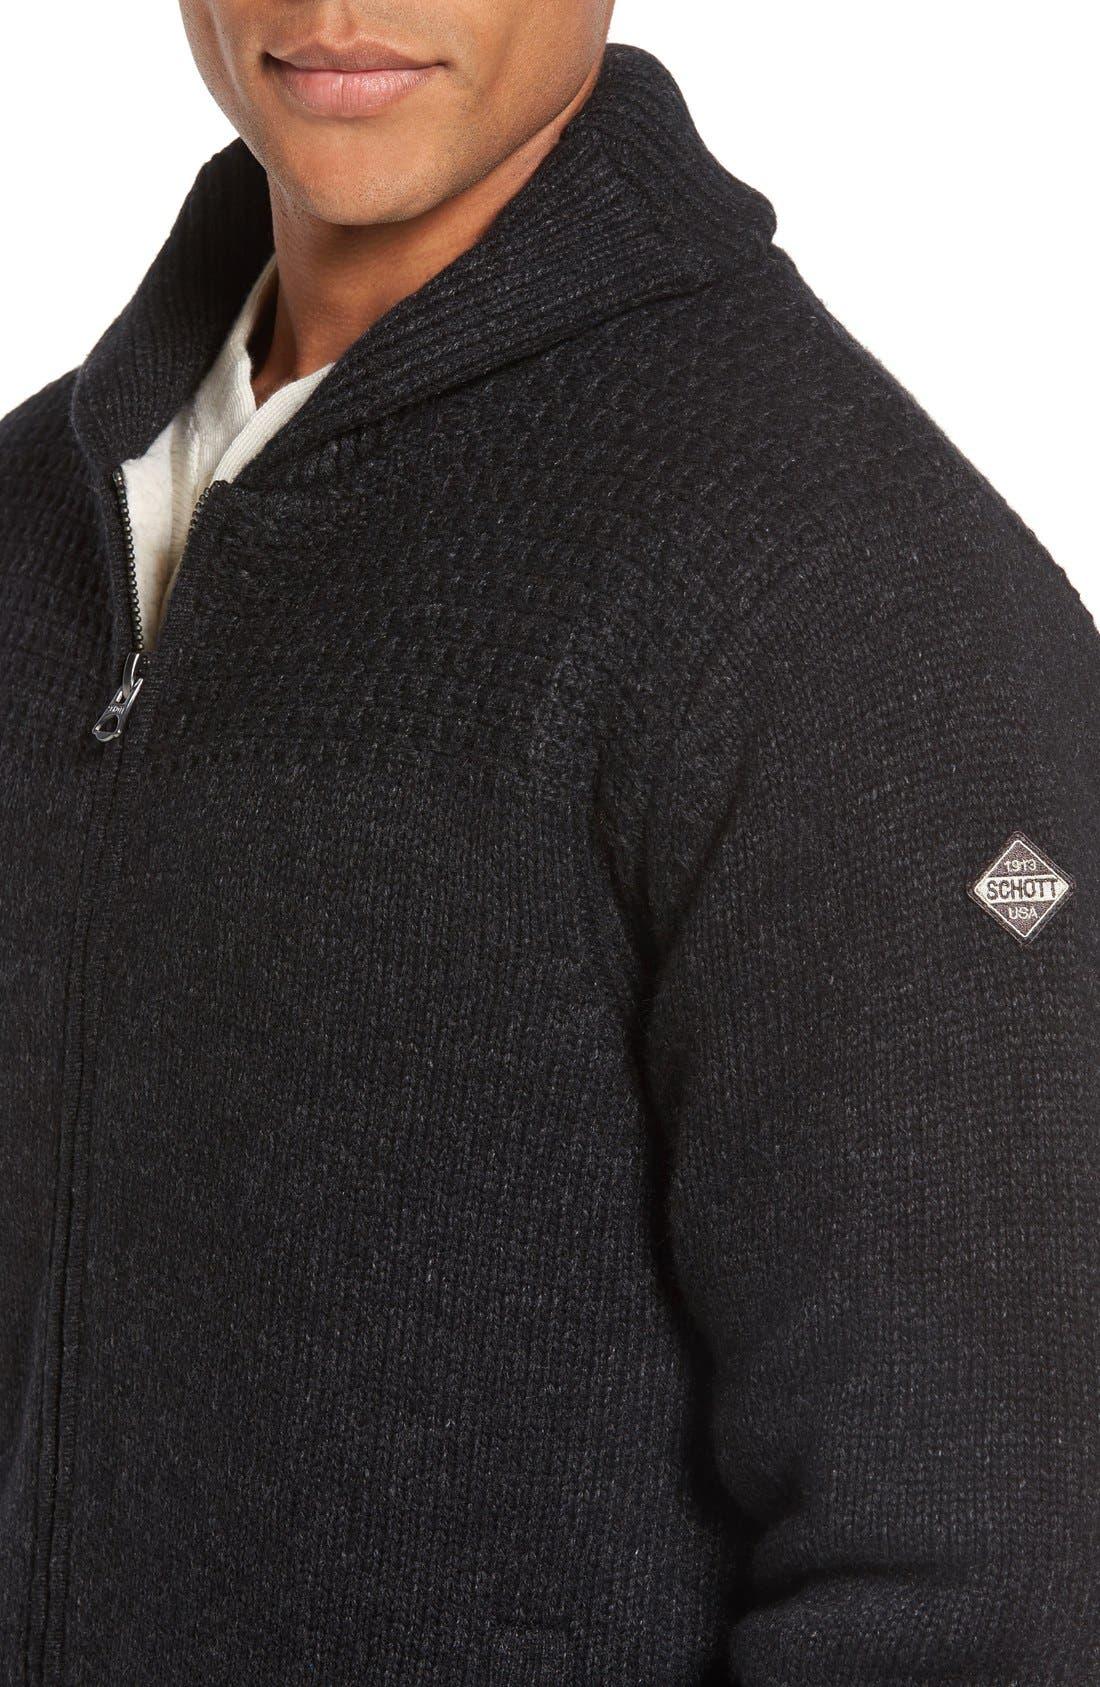 SCHOTT NYC,                             Lined Wool Zip Sweater,                             Alternate thumbnail 7, color,                             BLACK